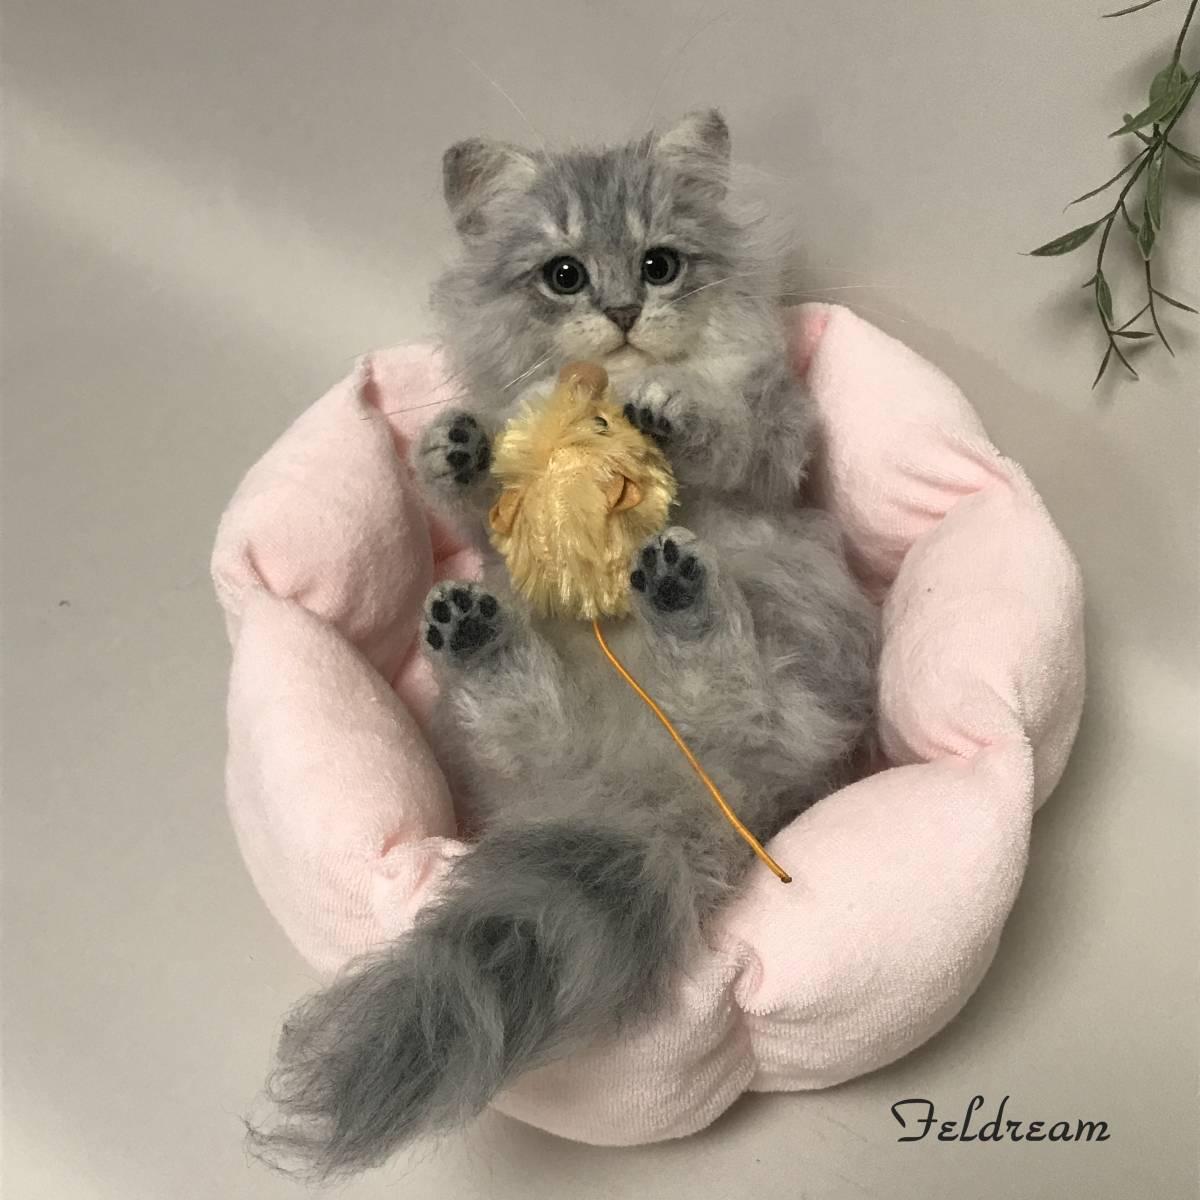 Feldream◆羊毛フェルト猫 寝転ぶチンチラシルバー子猫ちゃん ベッド付き ≪実物大≫  ペルシャ ハンドメイド _画像3